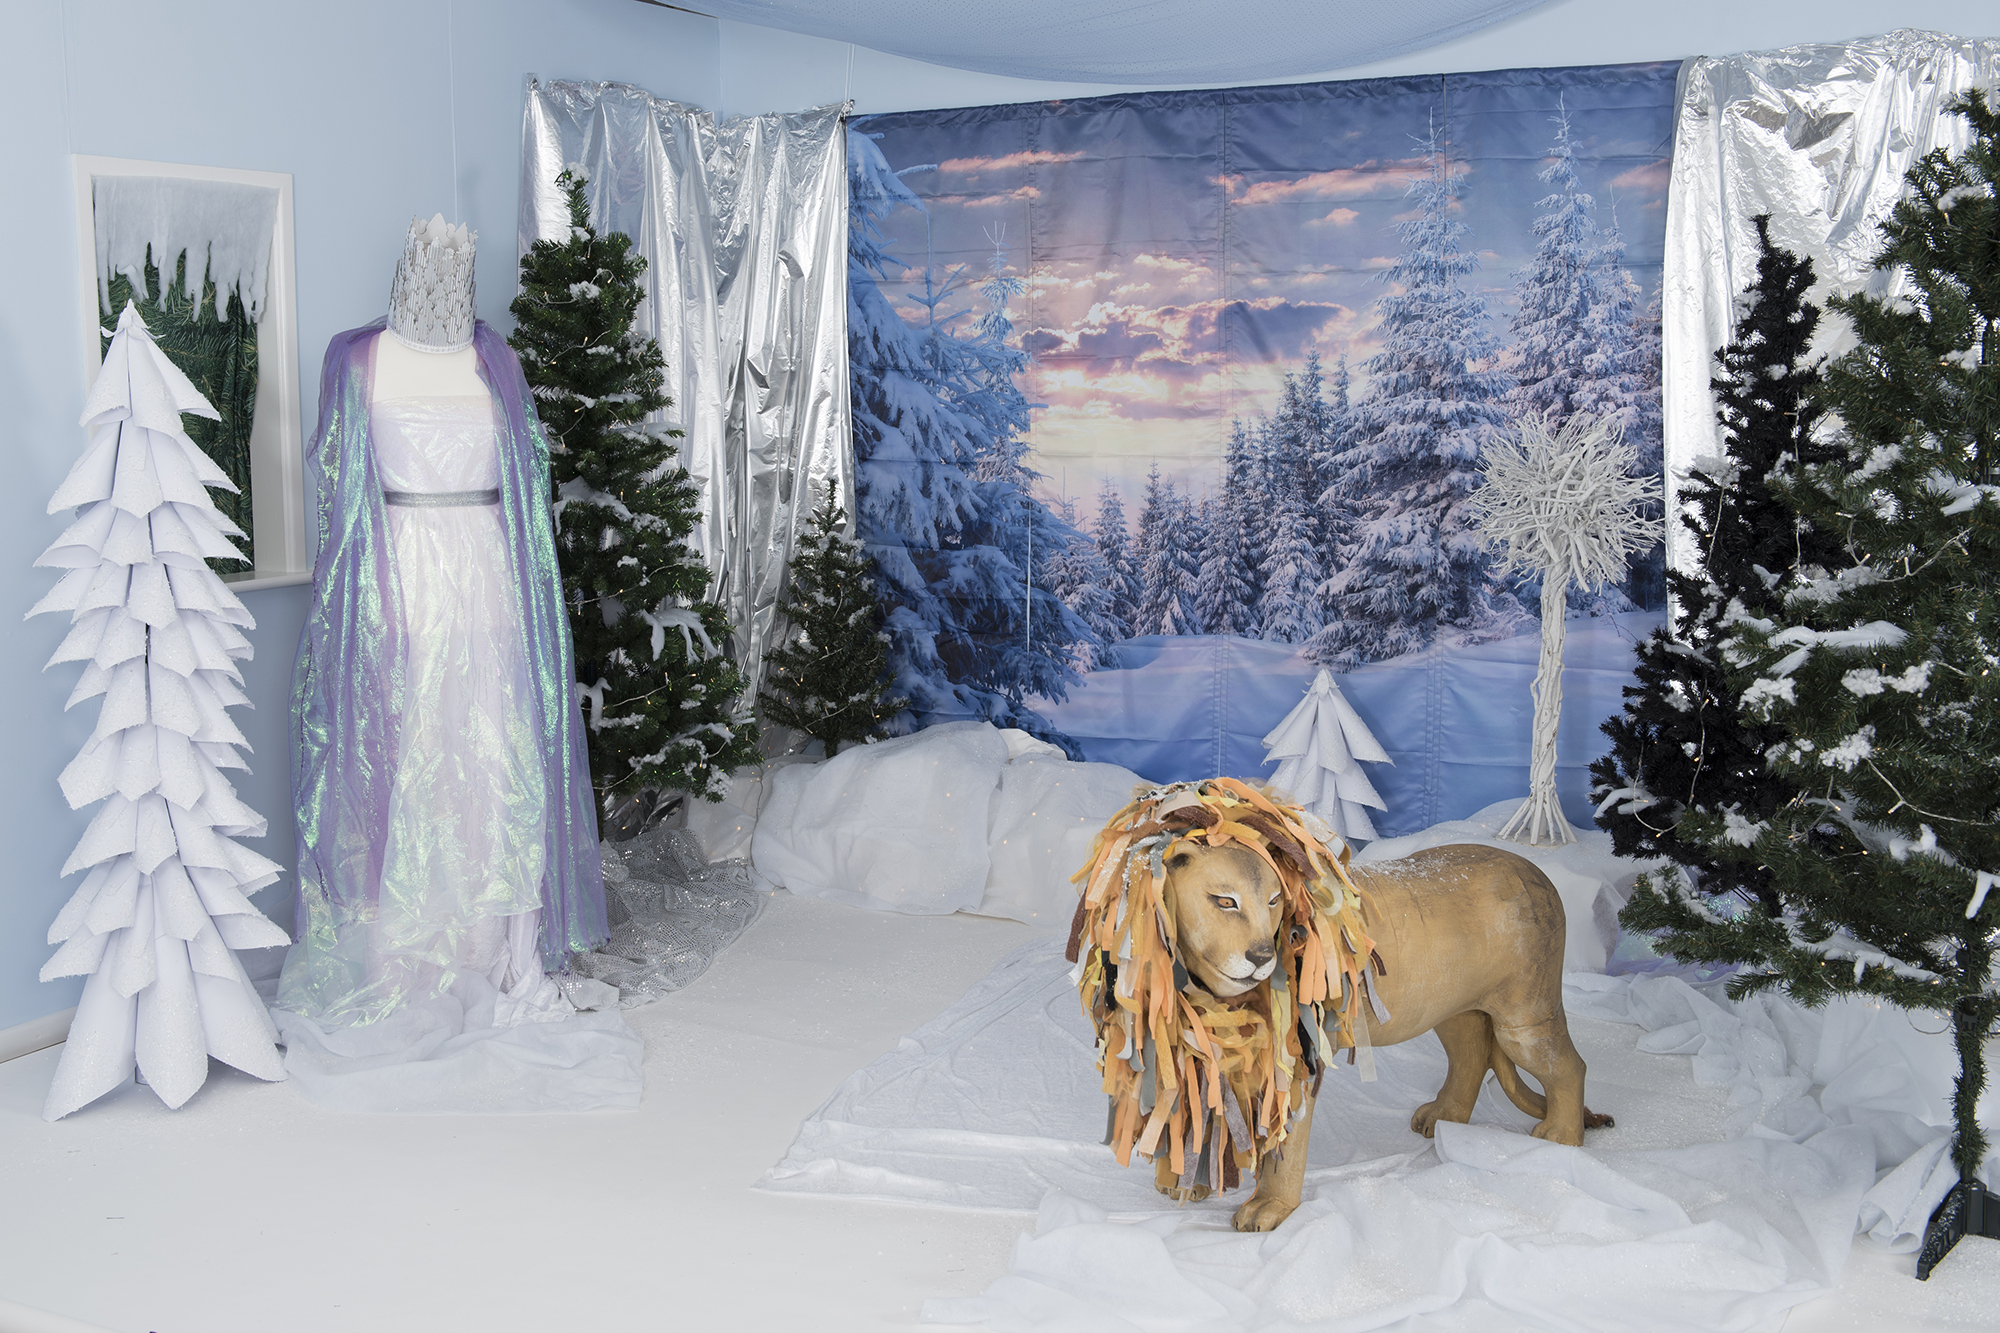 Frozen Immersive environment